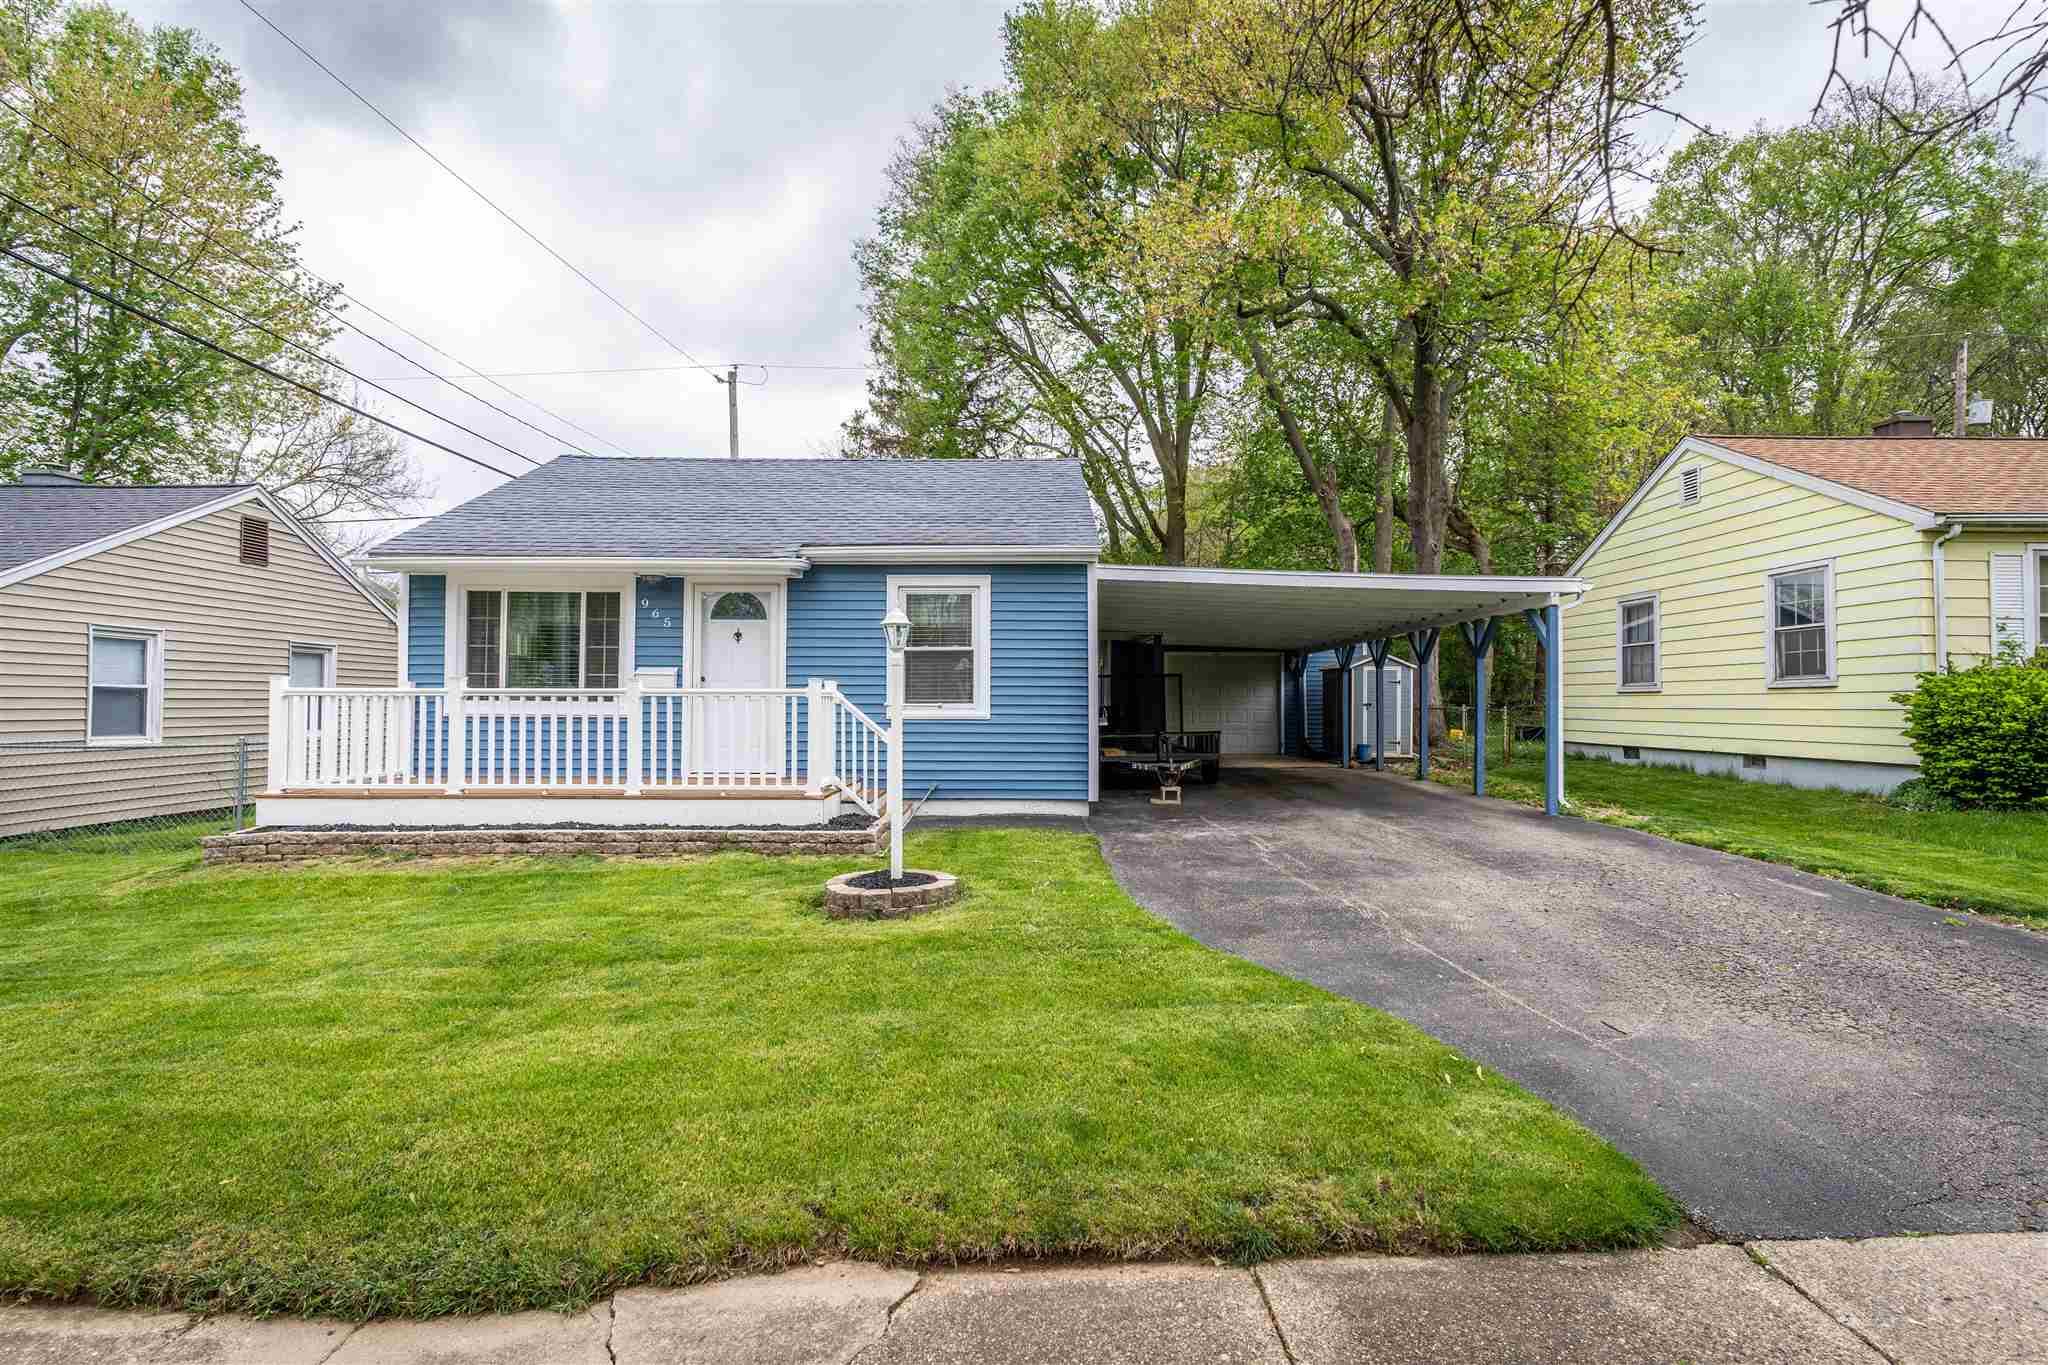 965 S TONTI Property Photo - Peoria, IL real estate listing